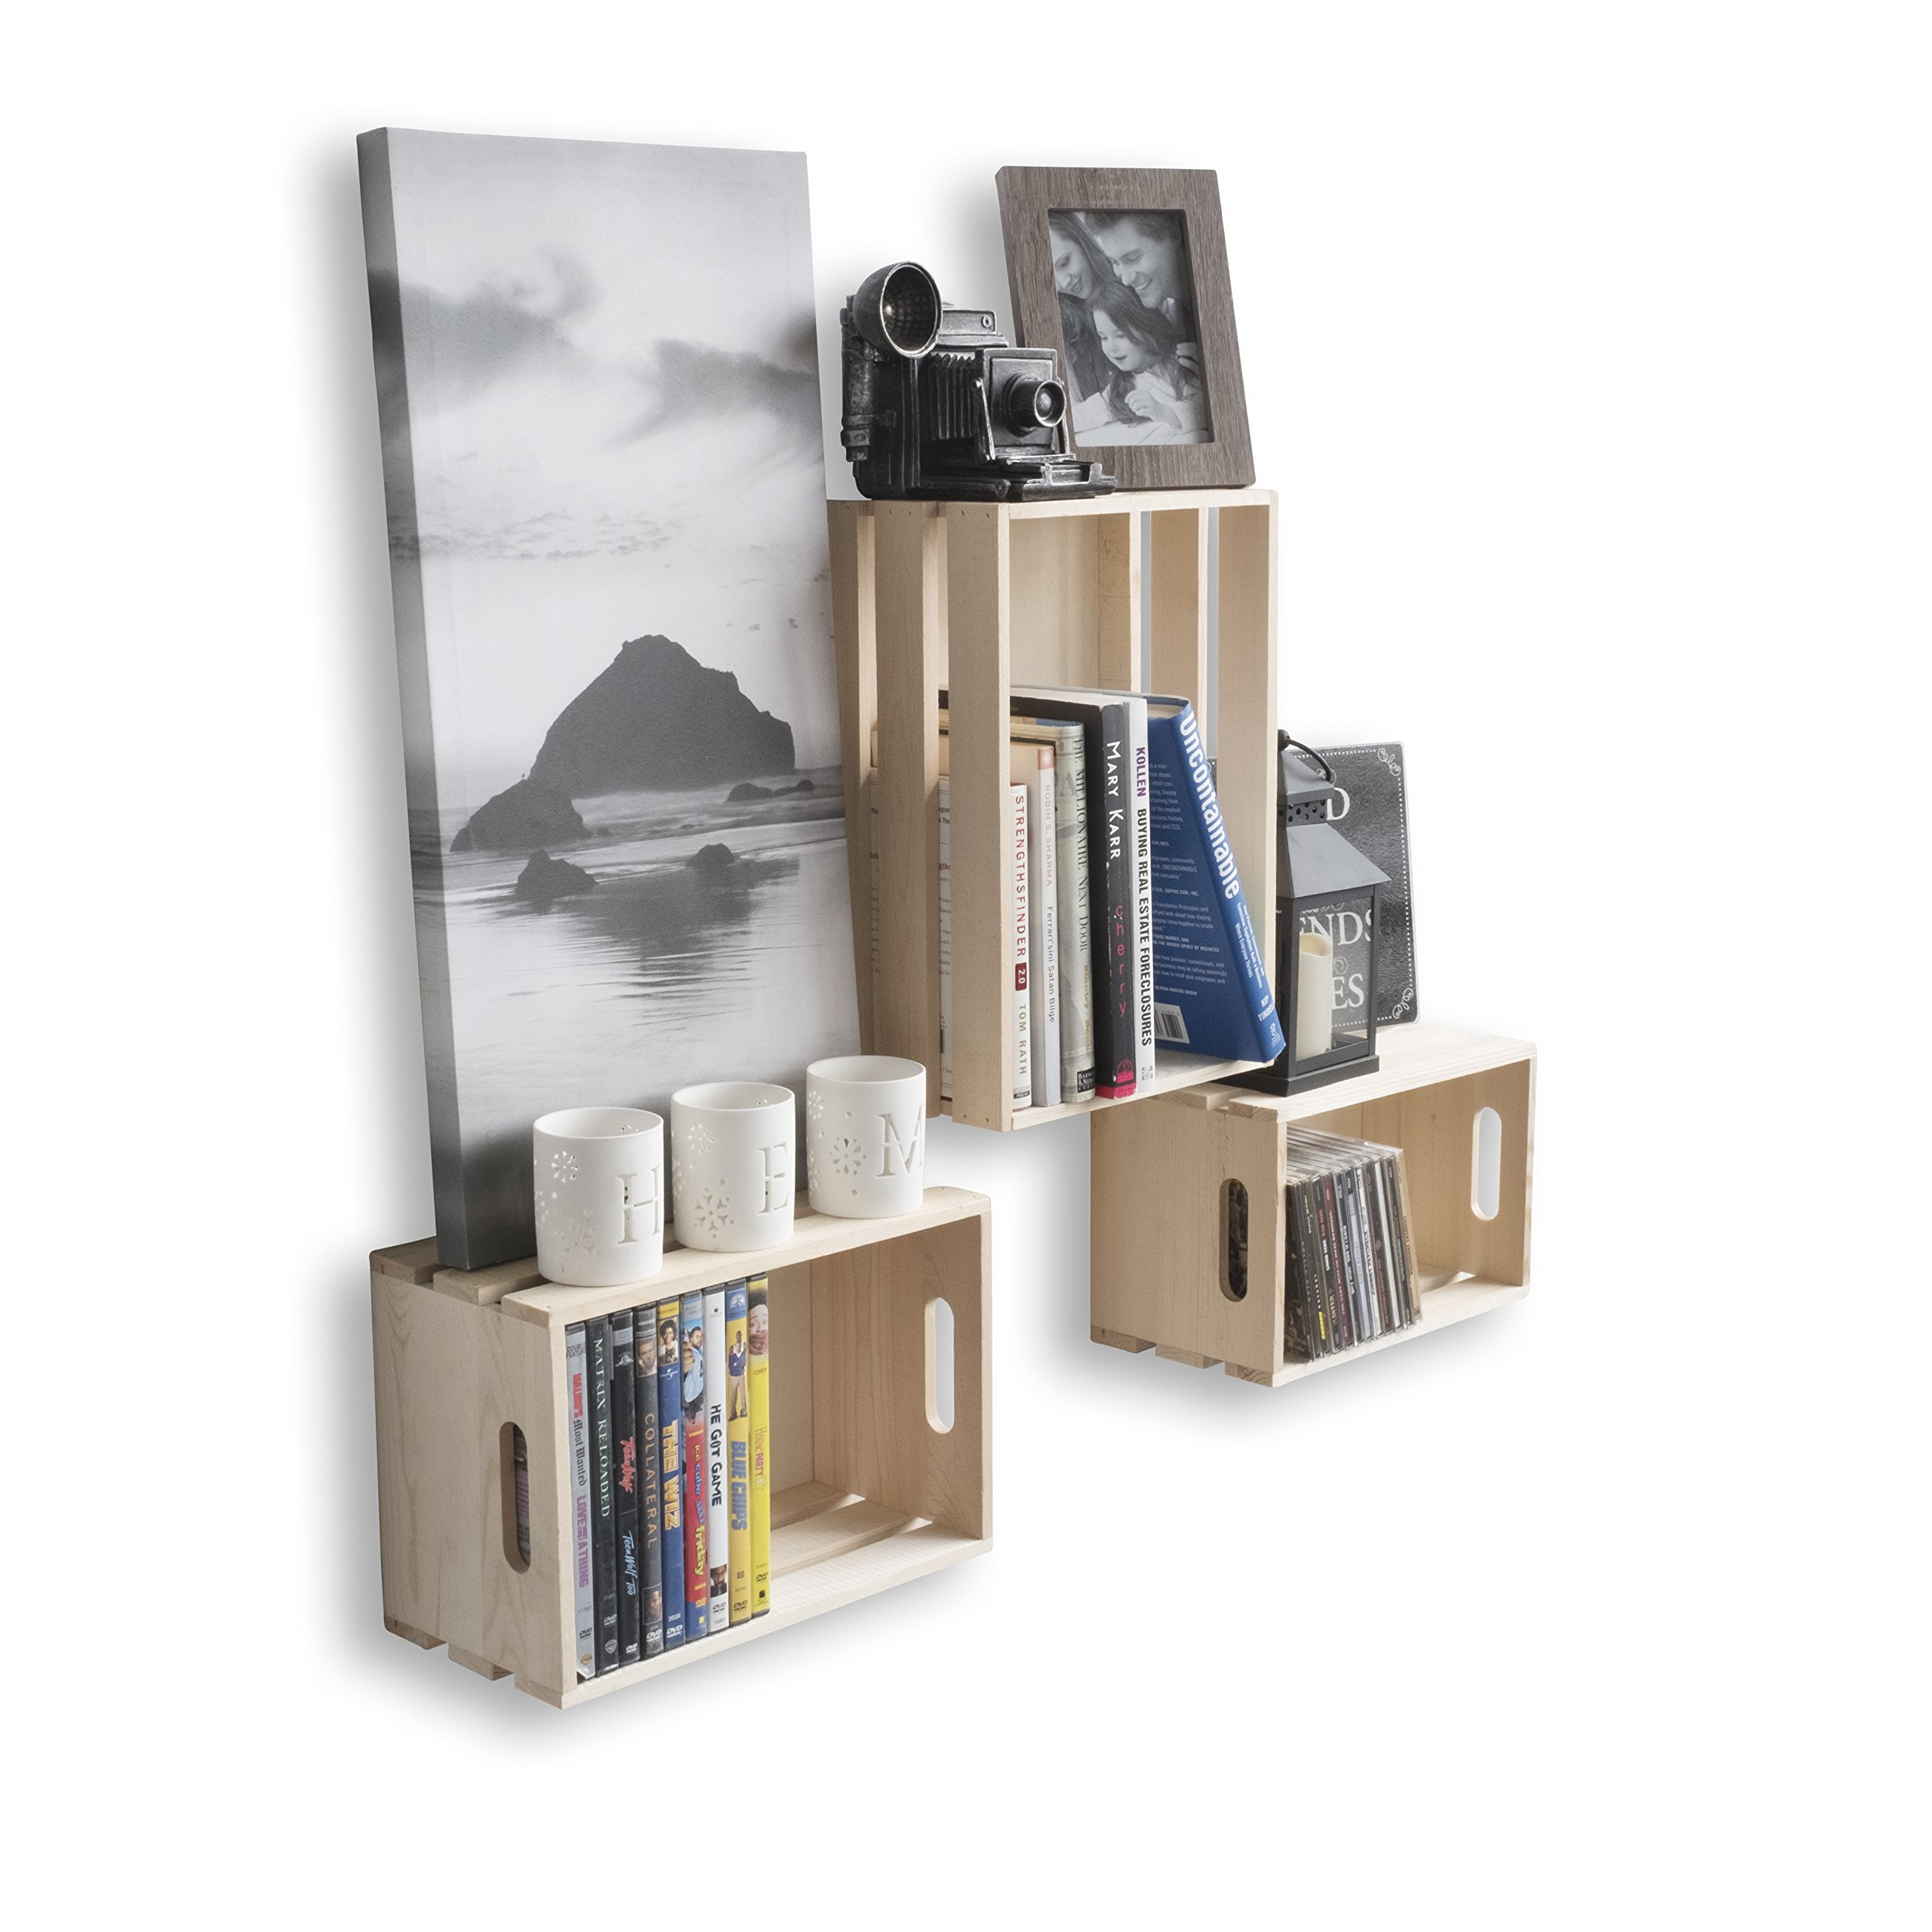 Wallniture Rustic Storage Bin Crates Organizer Unfinished Wood Natural Birch Set of 3